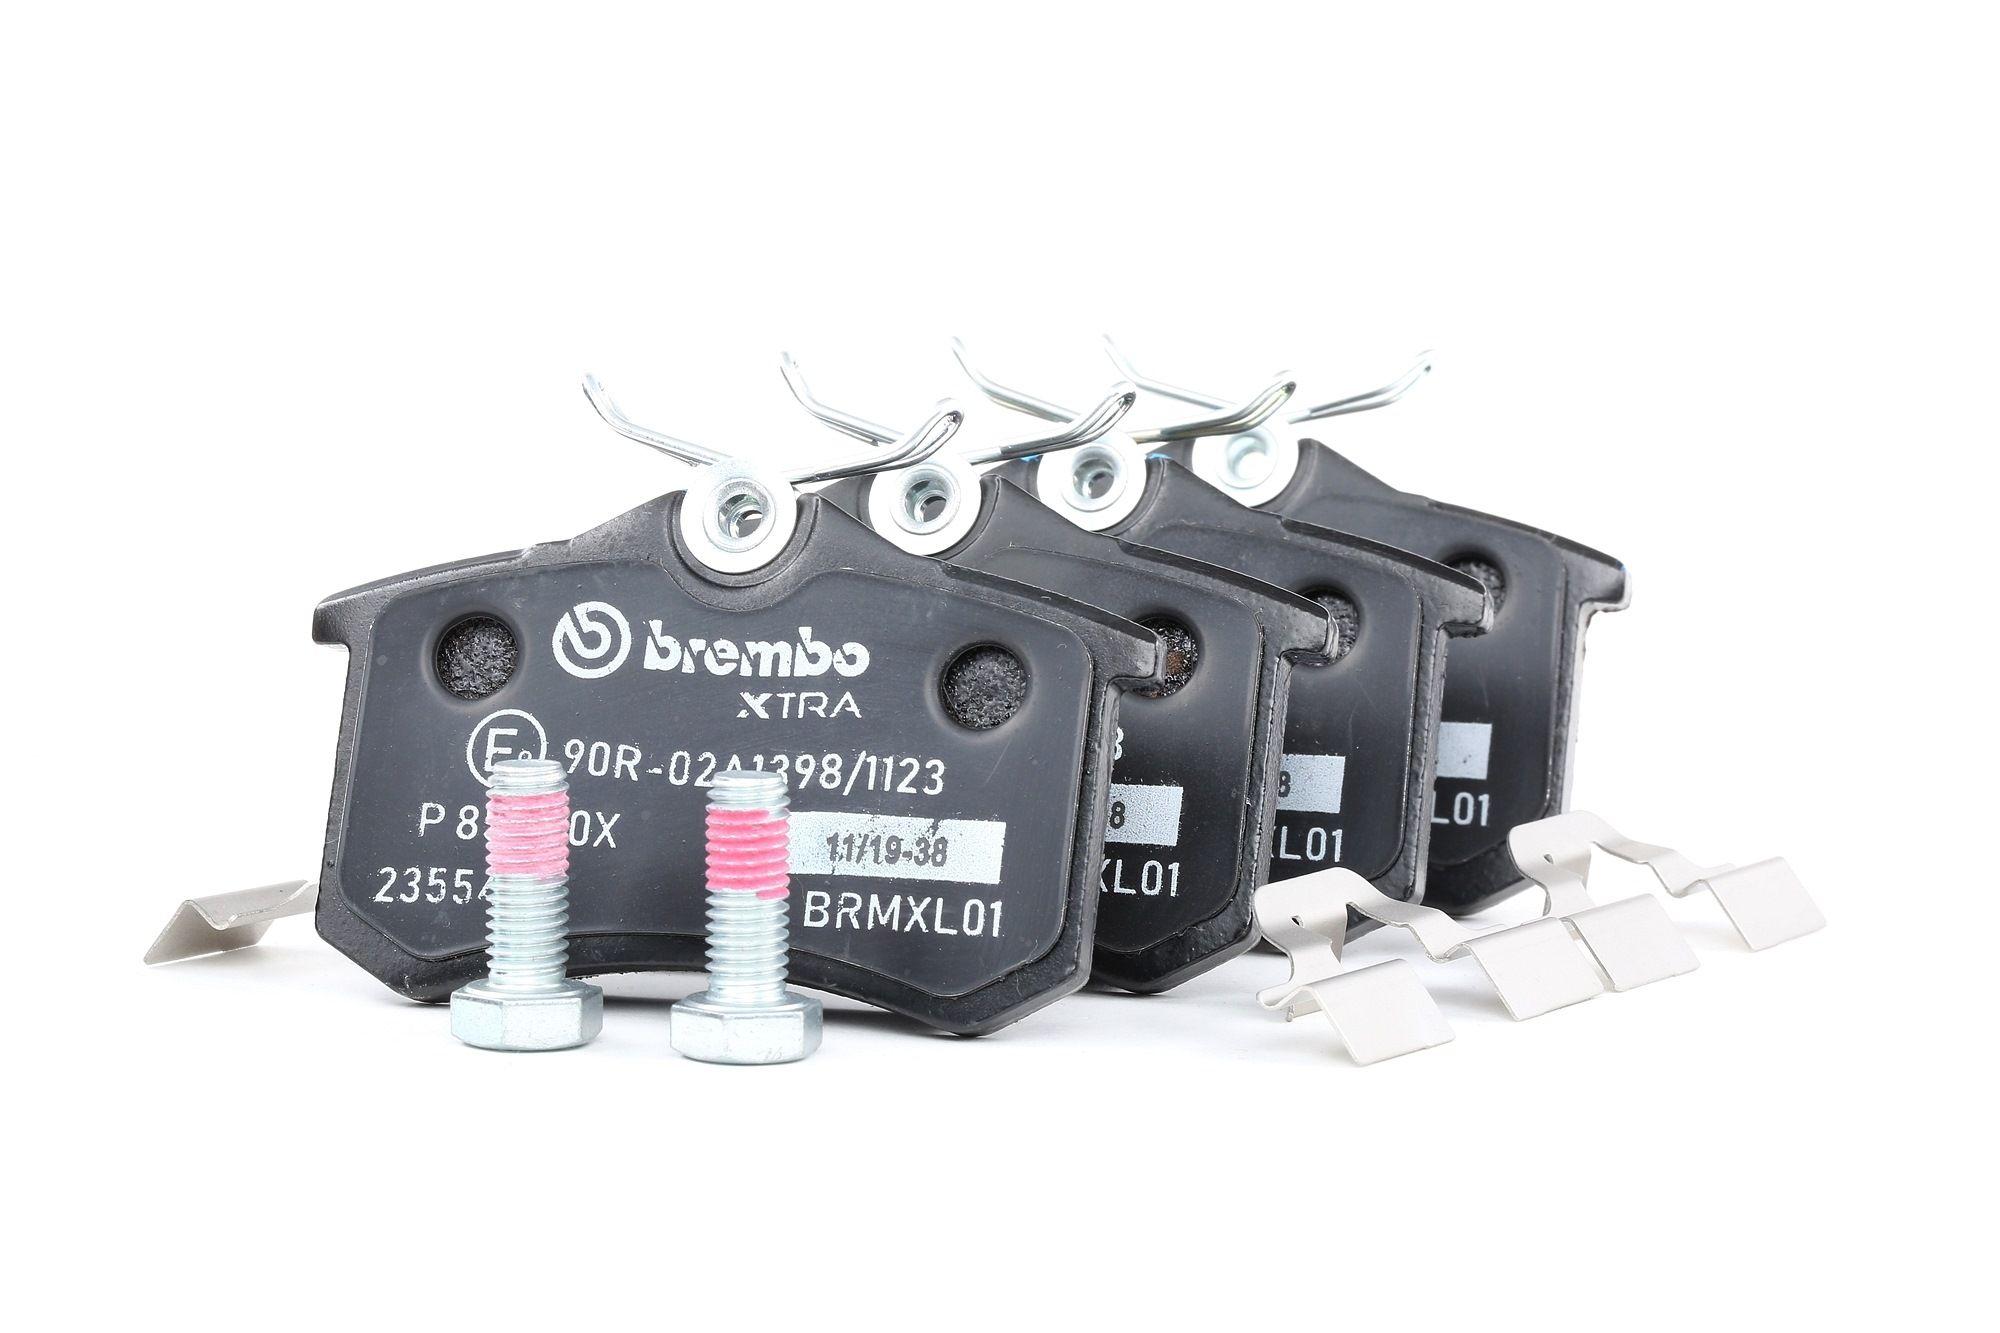 Bremsbelagsatz BREMBO D3407335 Bewertung